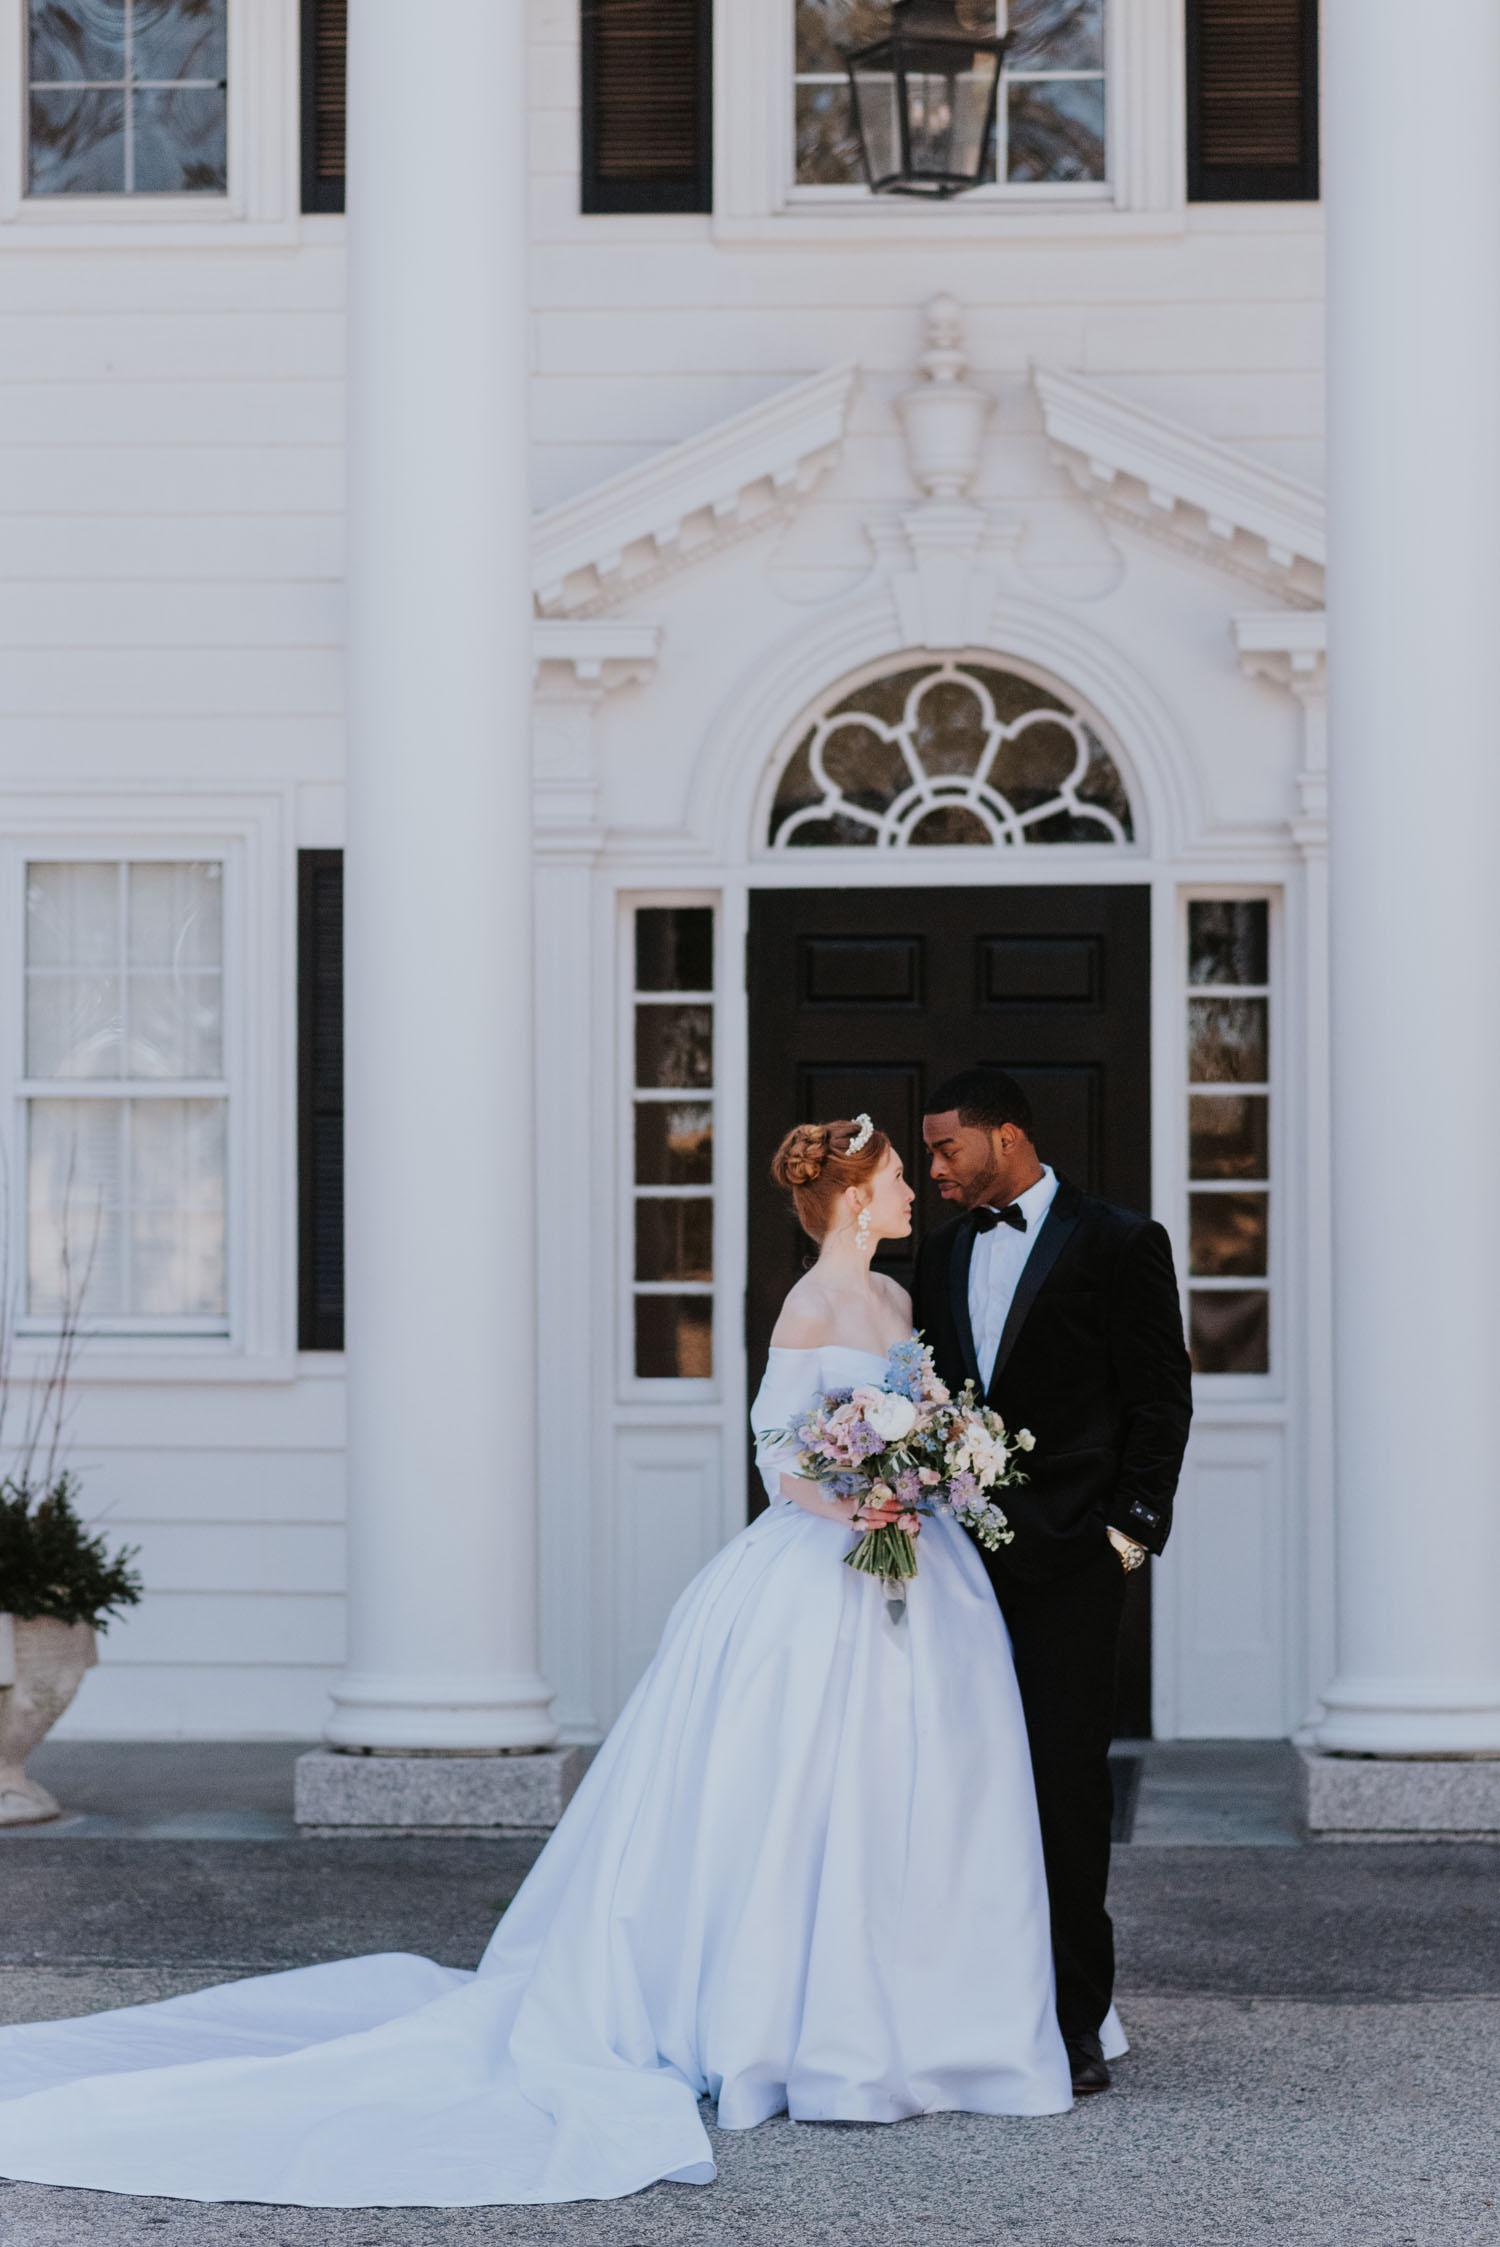 Bridgerton-themed wedding